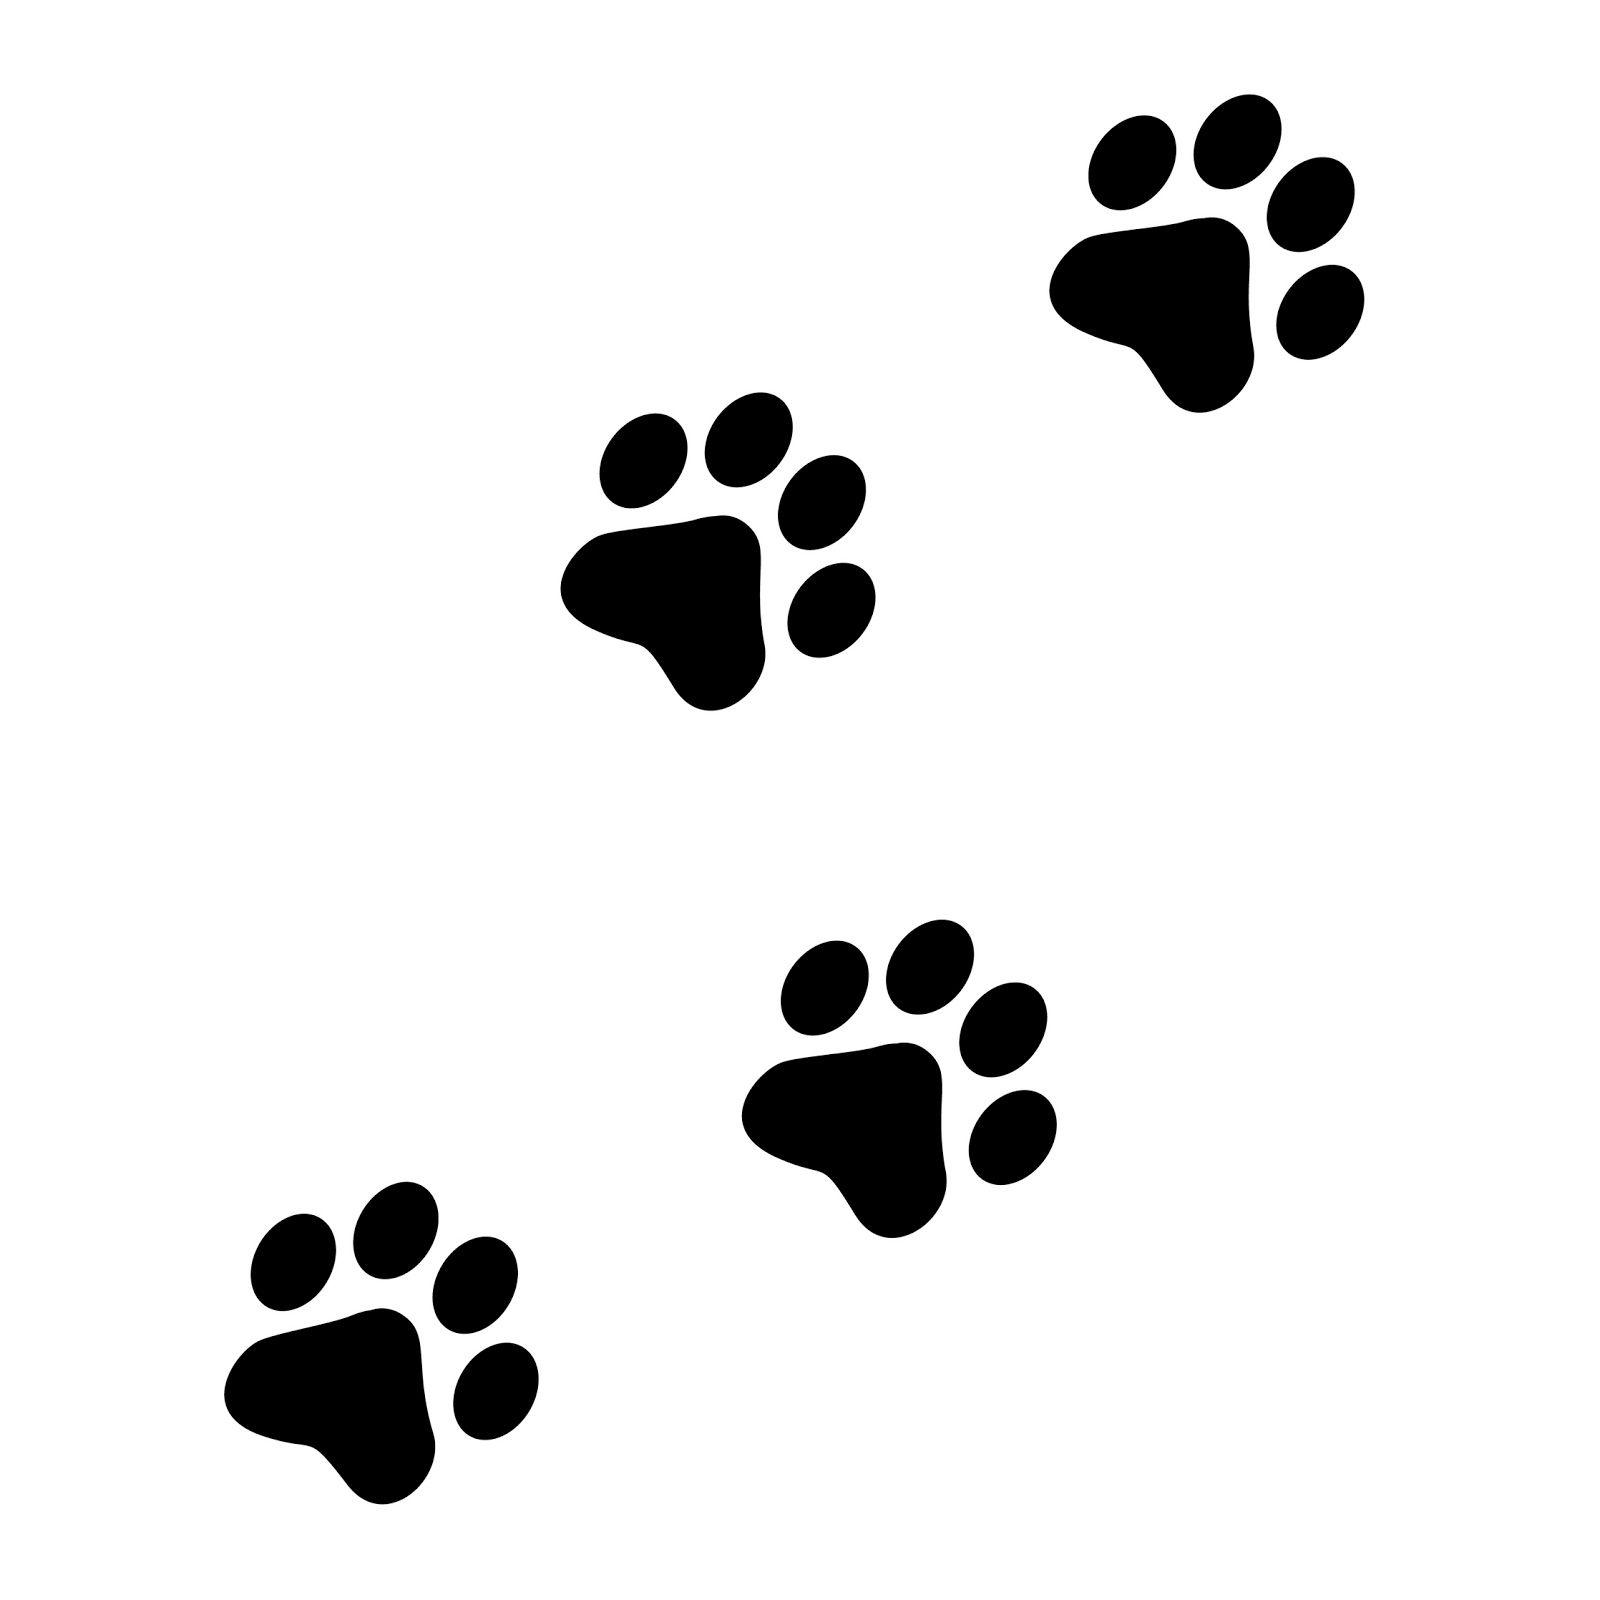 Huellas de gatos | huellas tattoo | Pinterest | Huellas de gato ...